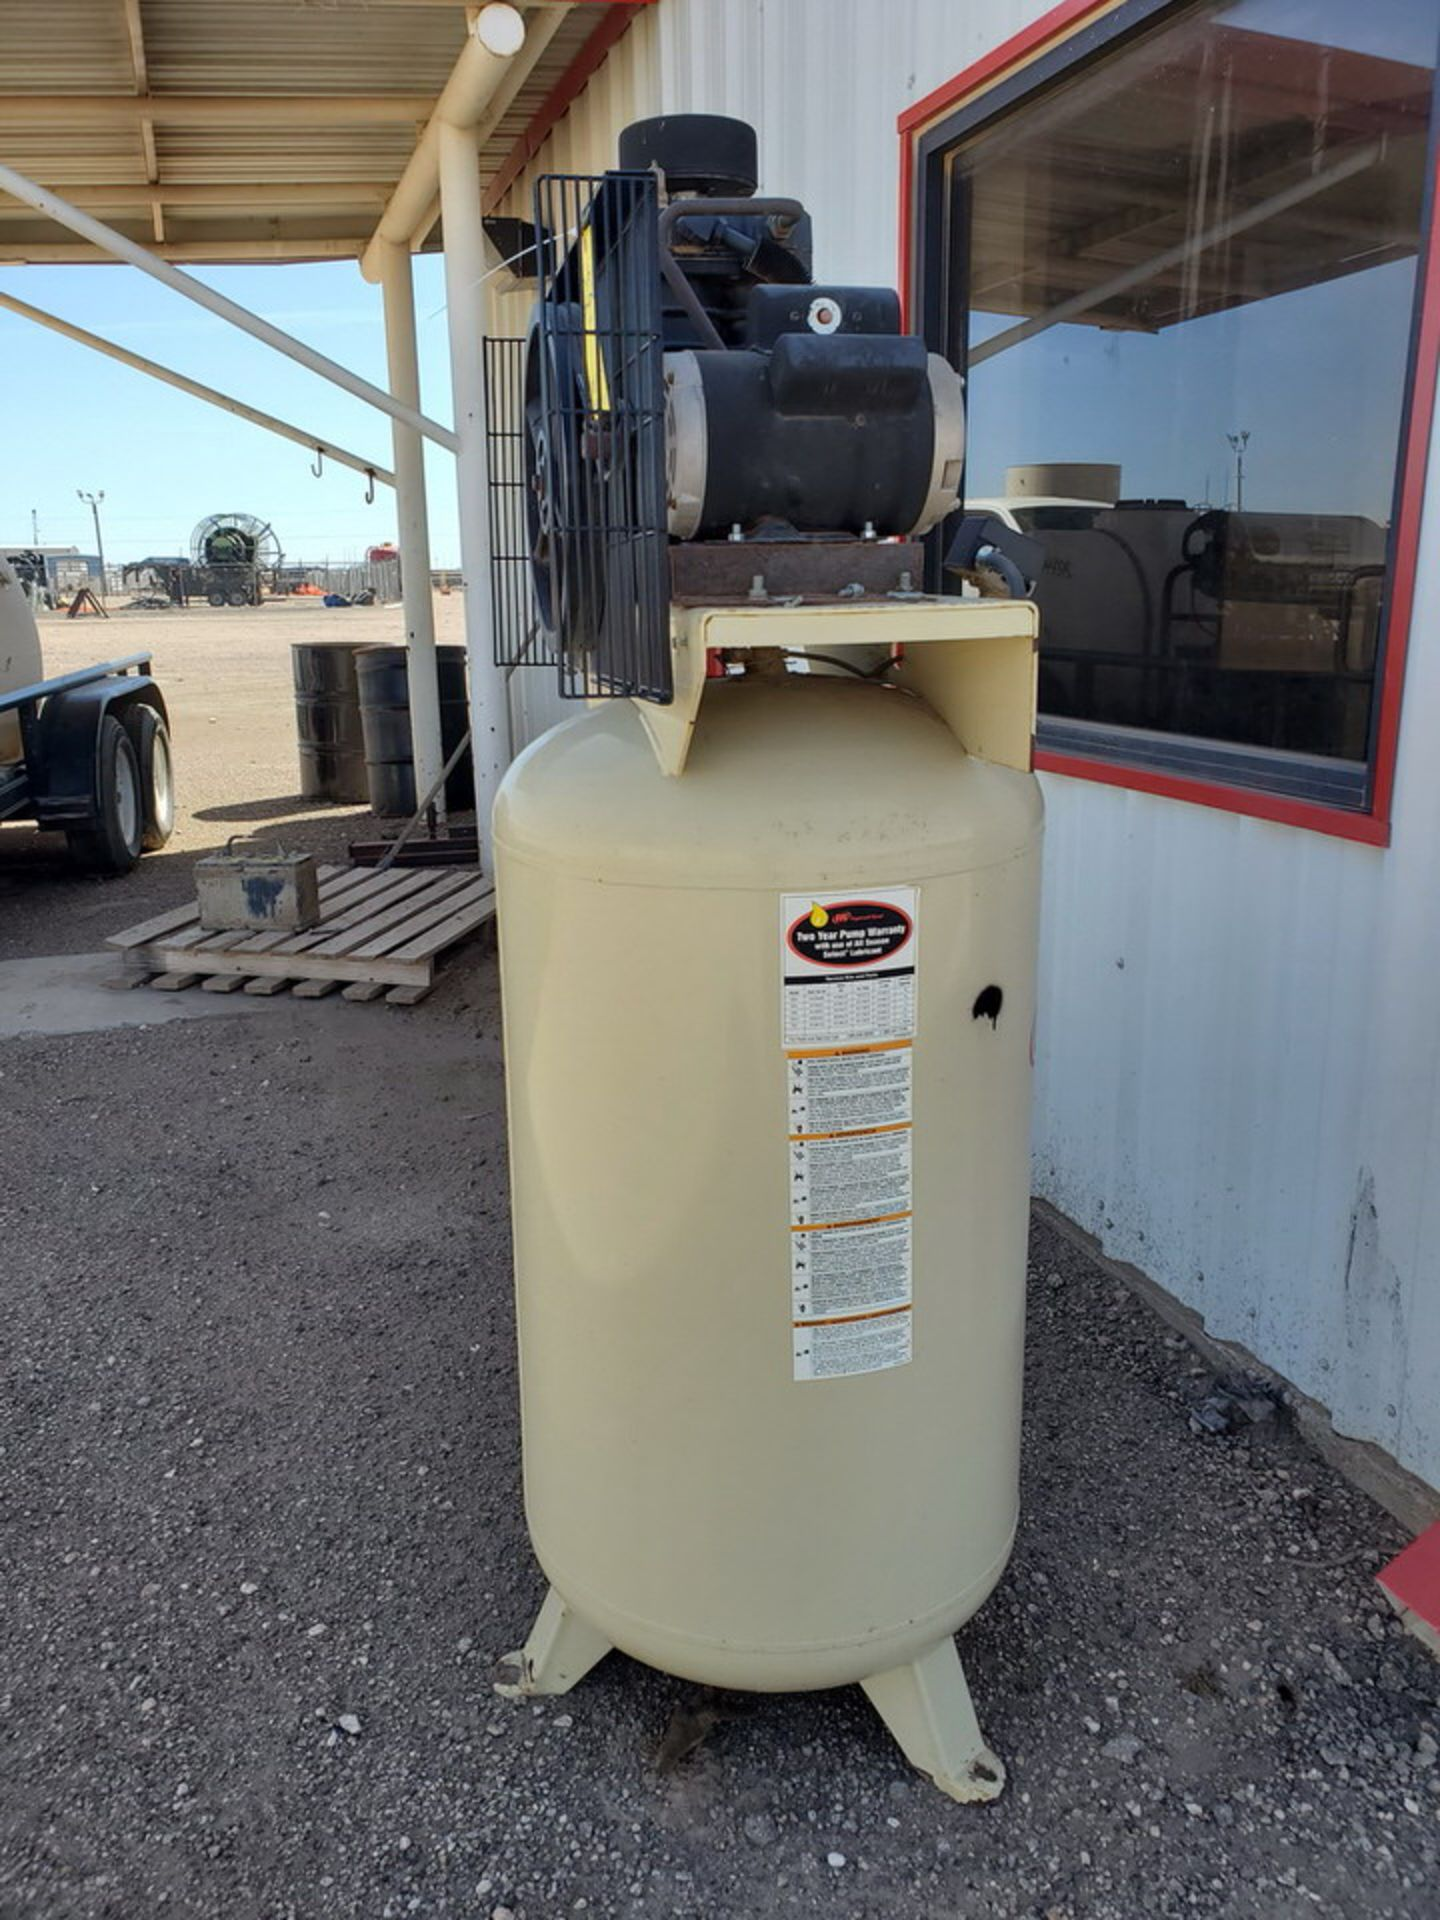 IR TS4N5 Air Compressor 230V, 1PH, 60HZ, MAWP-175psi - Image 2 of 9